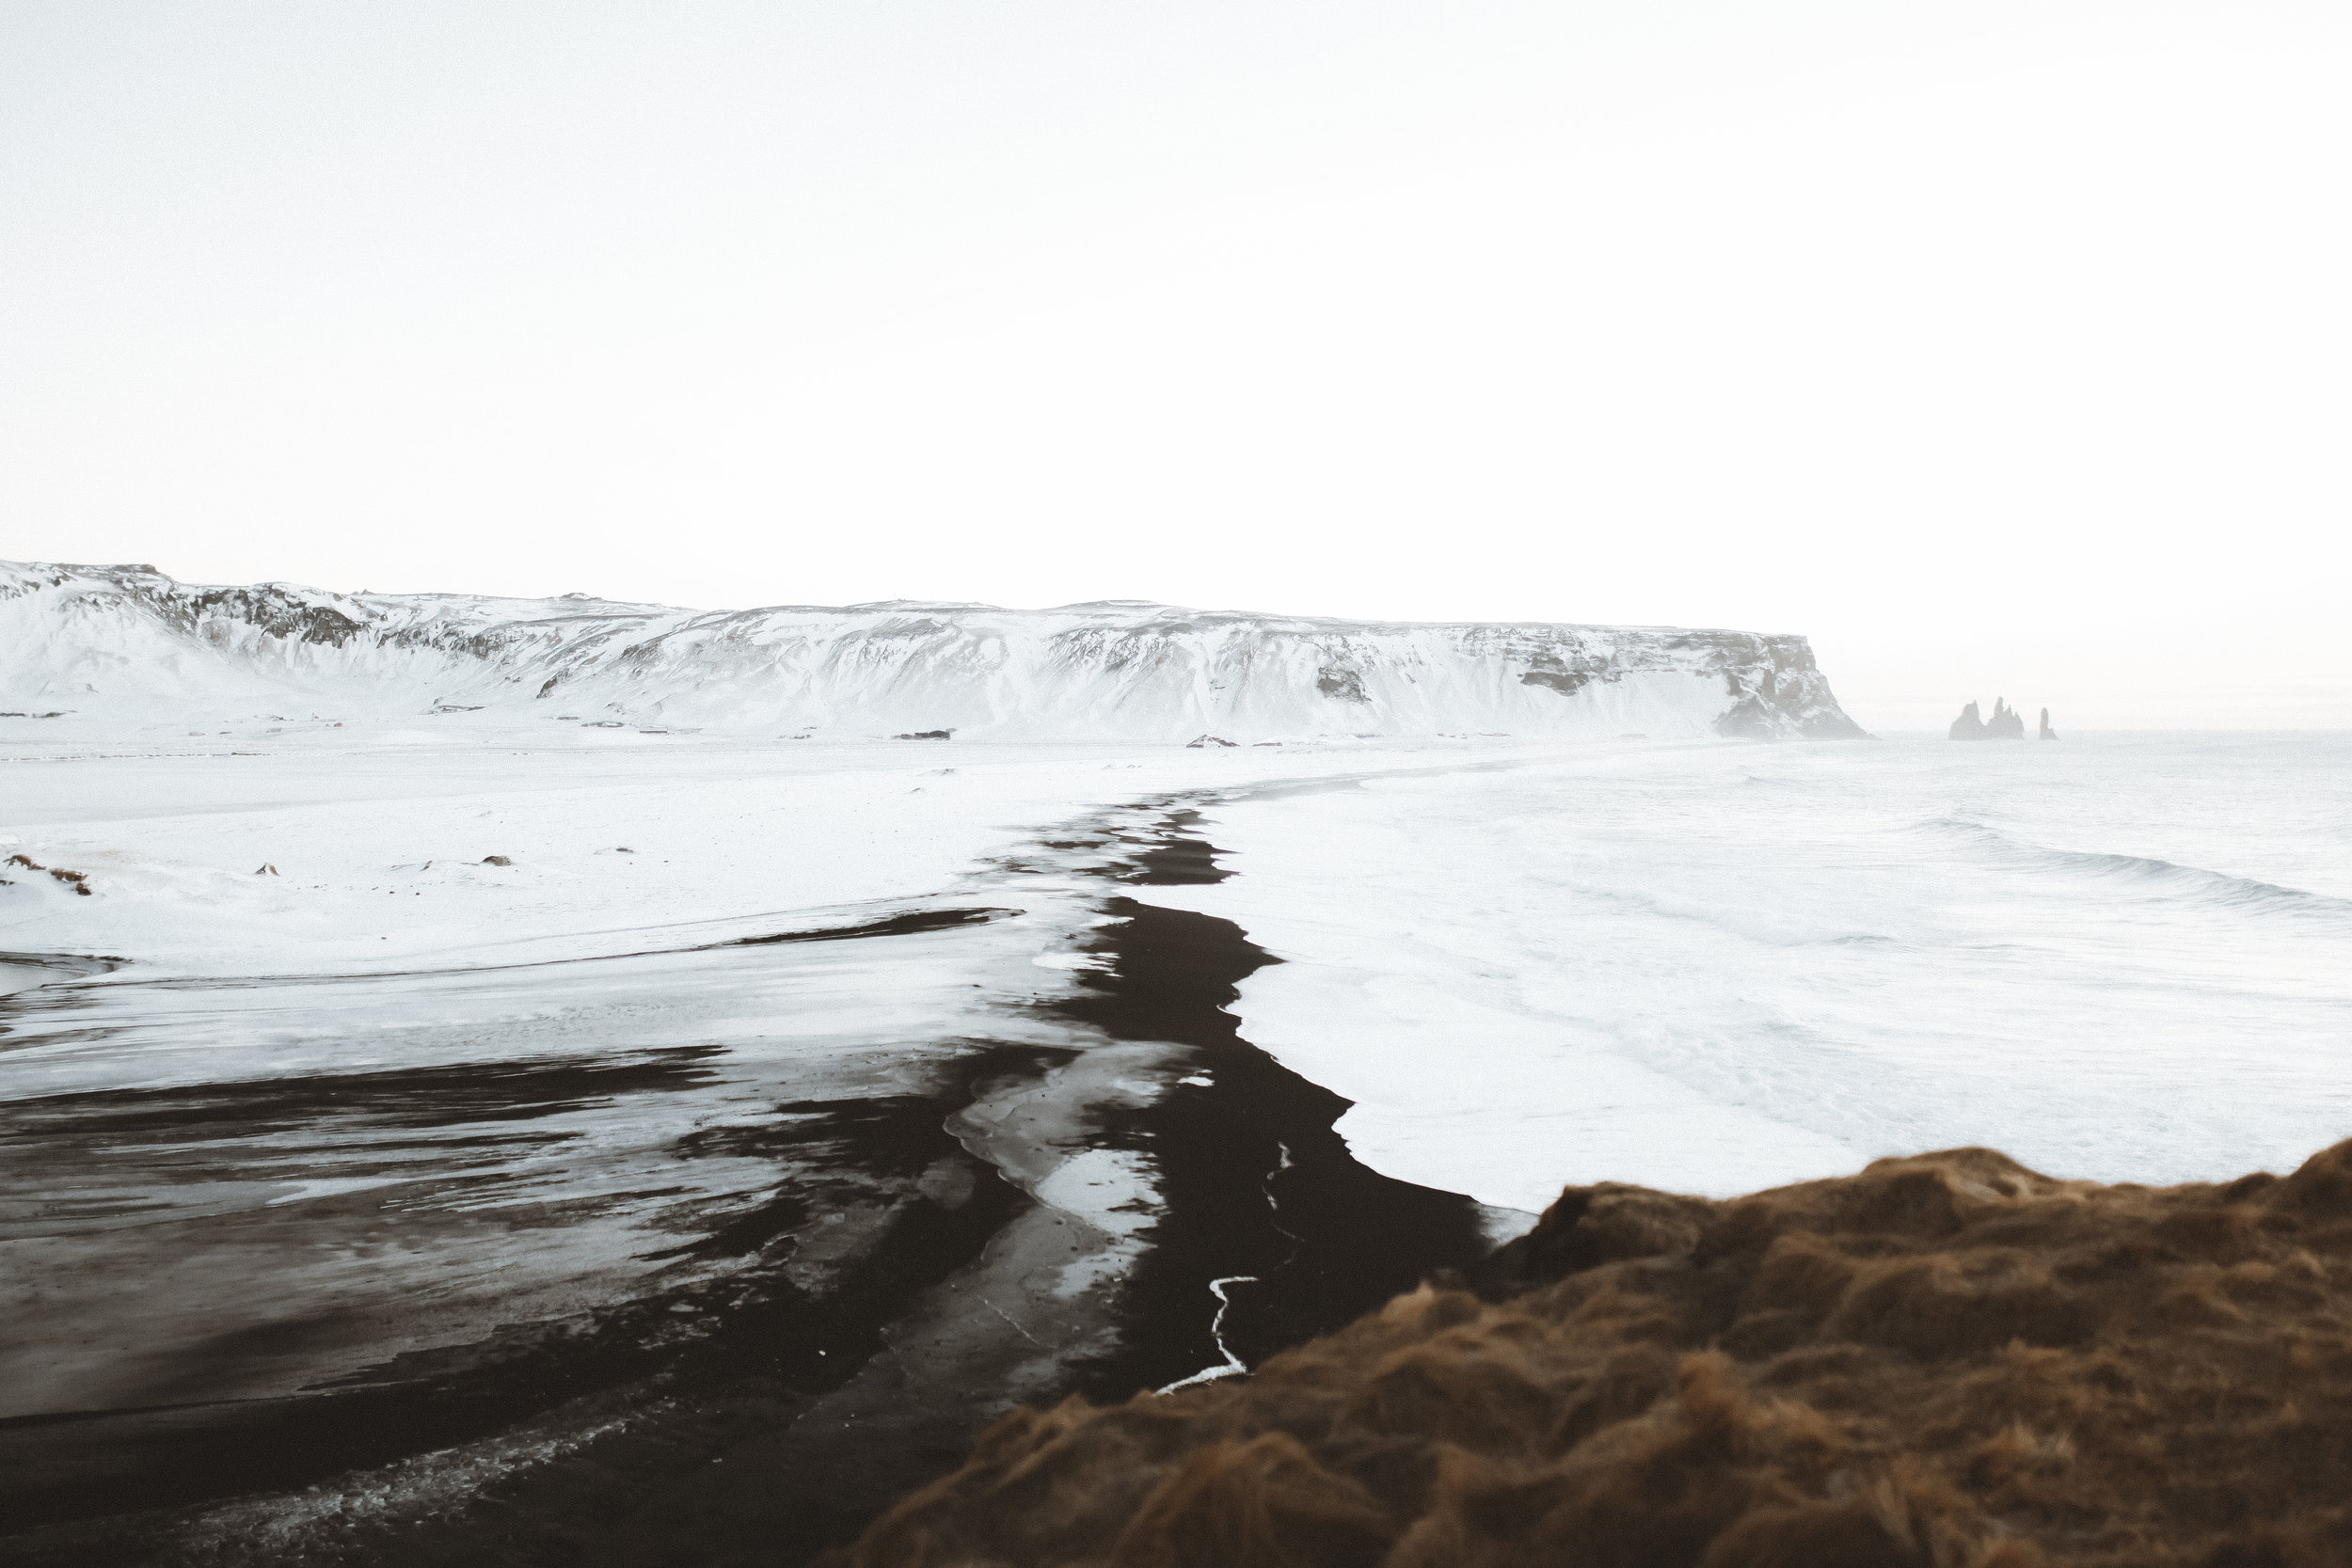 iceland_10 (1 of 1) copy.jpg